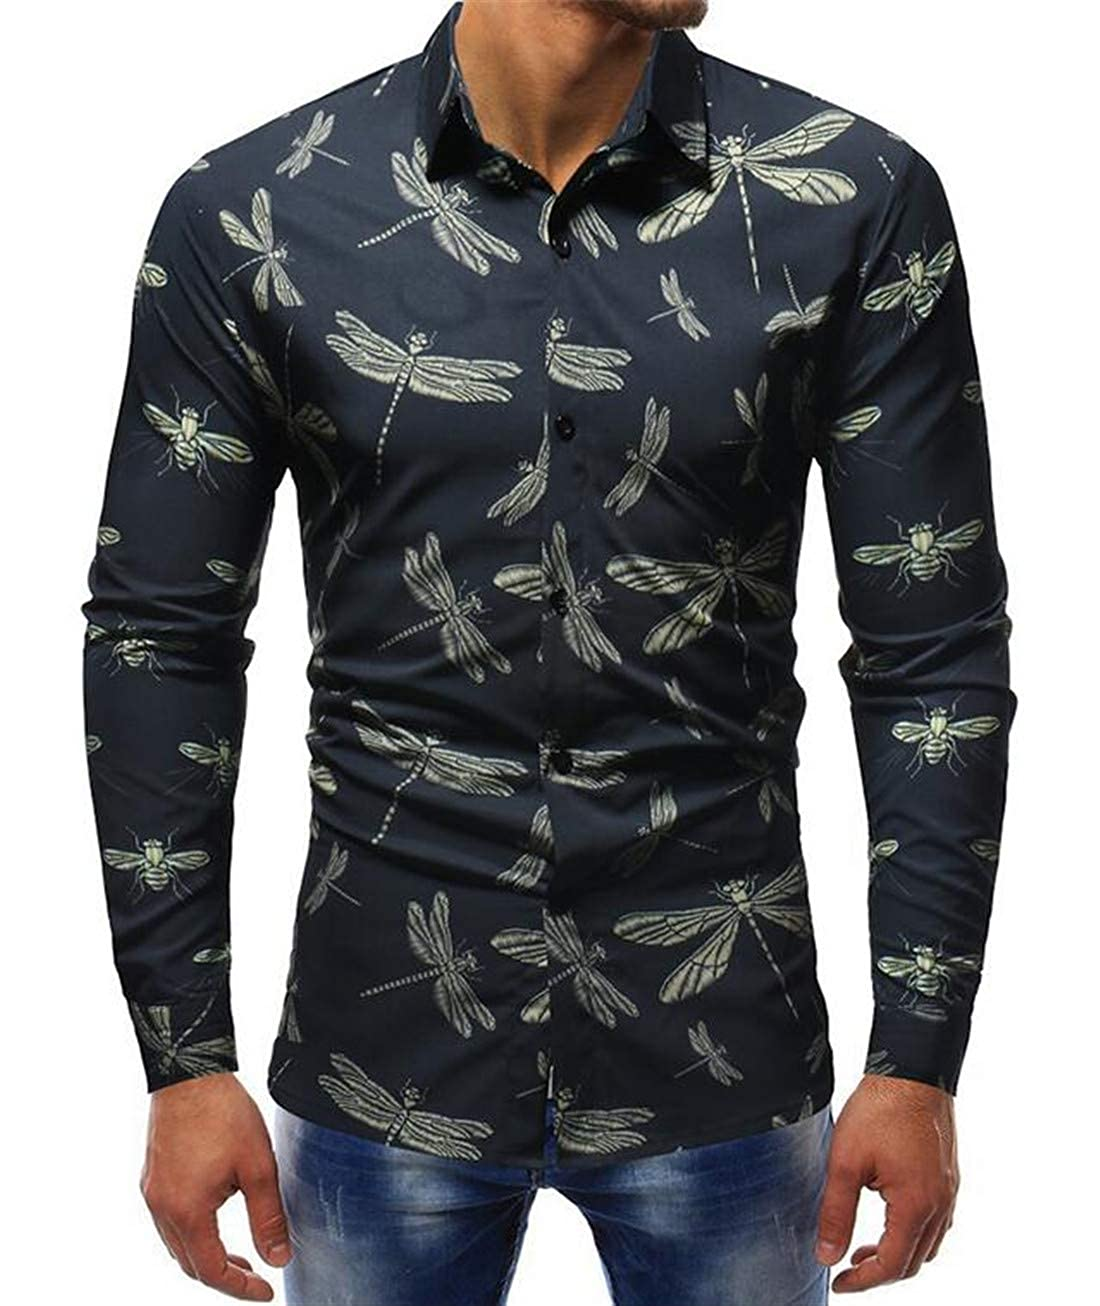 Nanquan Men Autumn Dragonfly Printing Long Sleeve Lapel Button Down Shirt